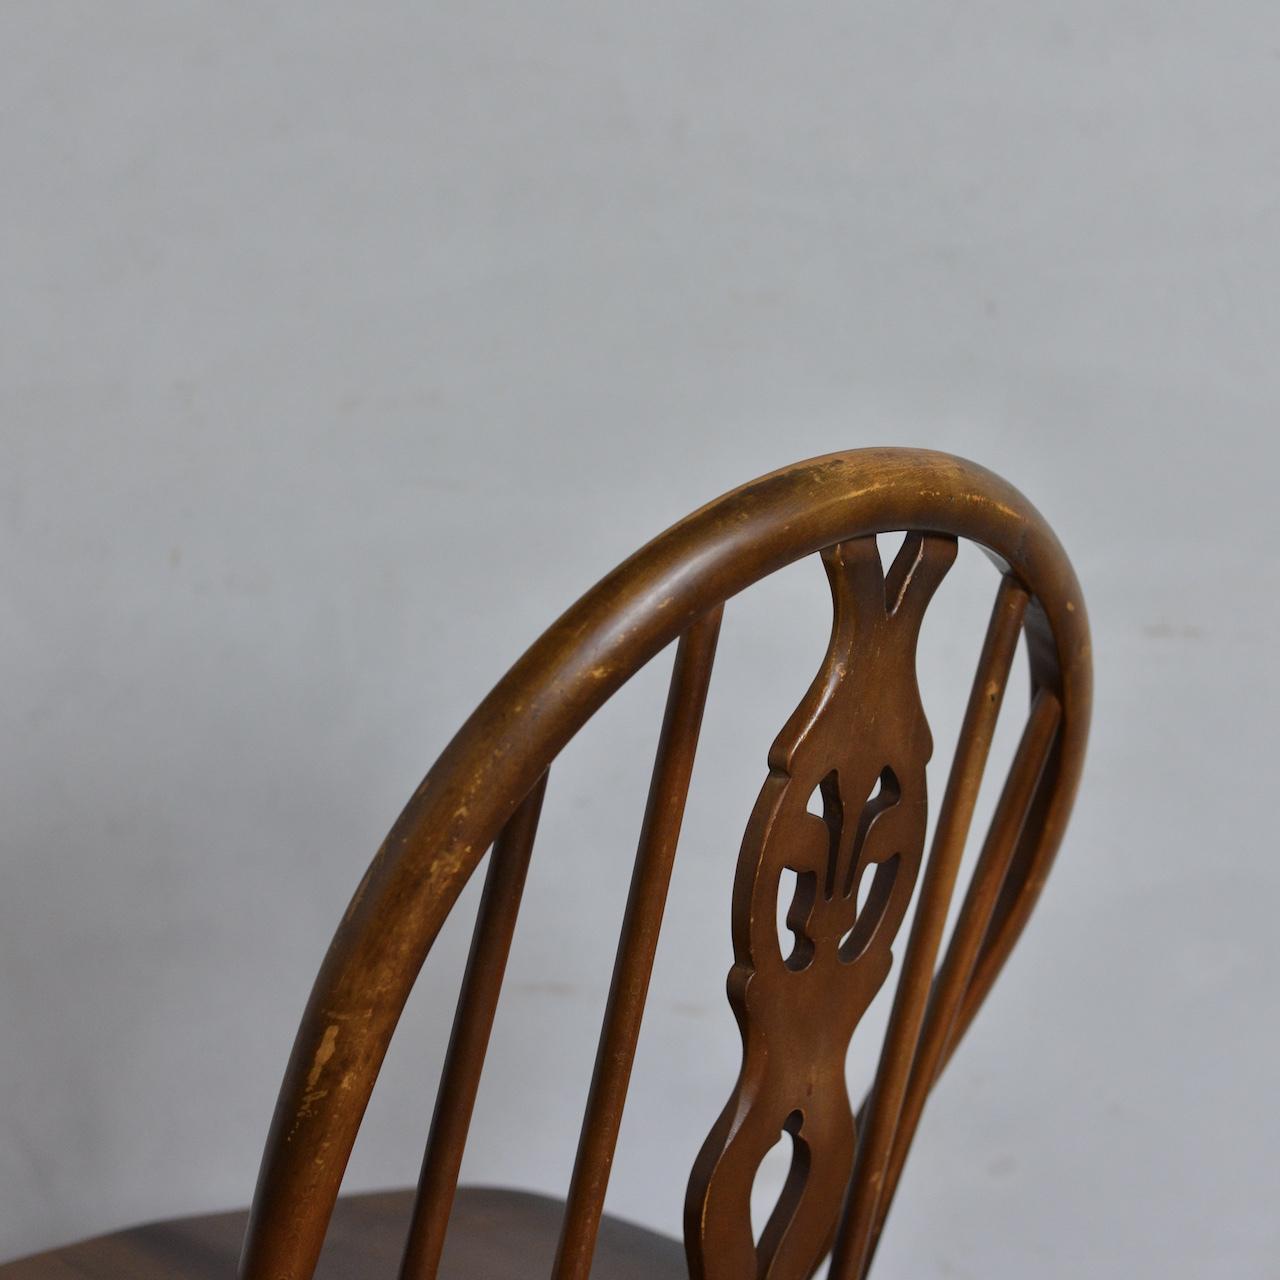 Ercol Thistleback Chair 【C】 / アーコール シスルバック チェア 〈ダイニングチェア・デスクチェア・椅子・コロニアル〉